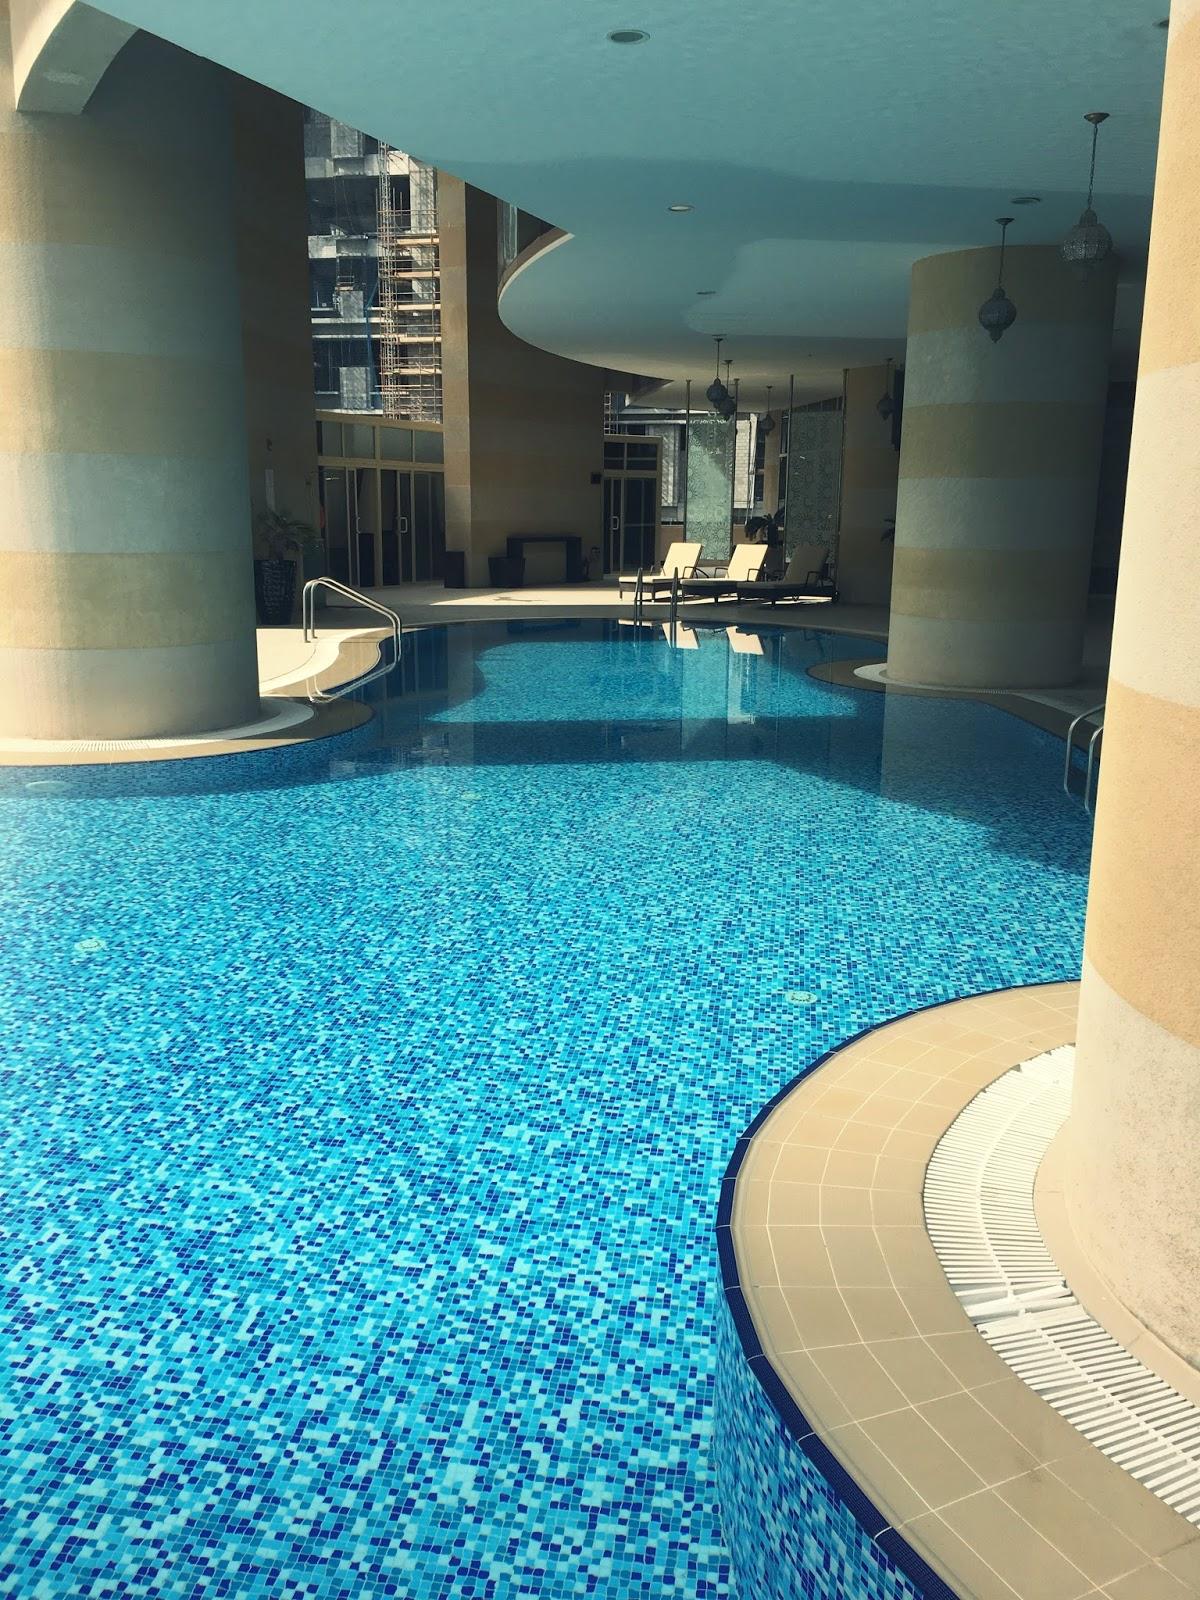 Meliá : A Taste of Spanish Hospitality in Doha \\\\ Photo Diary - The ...